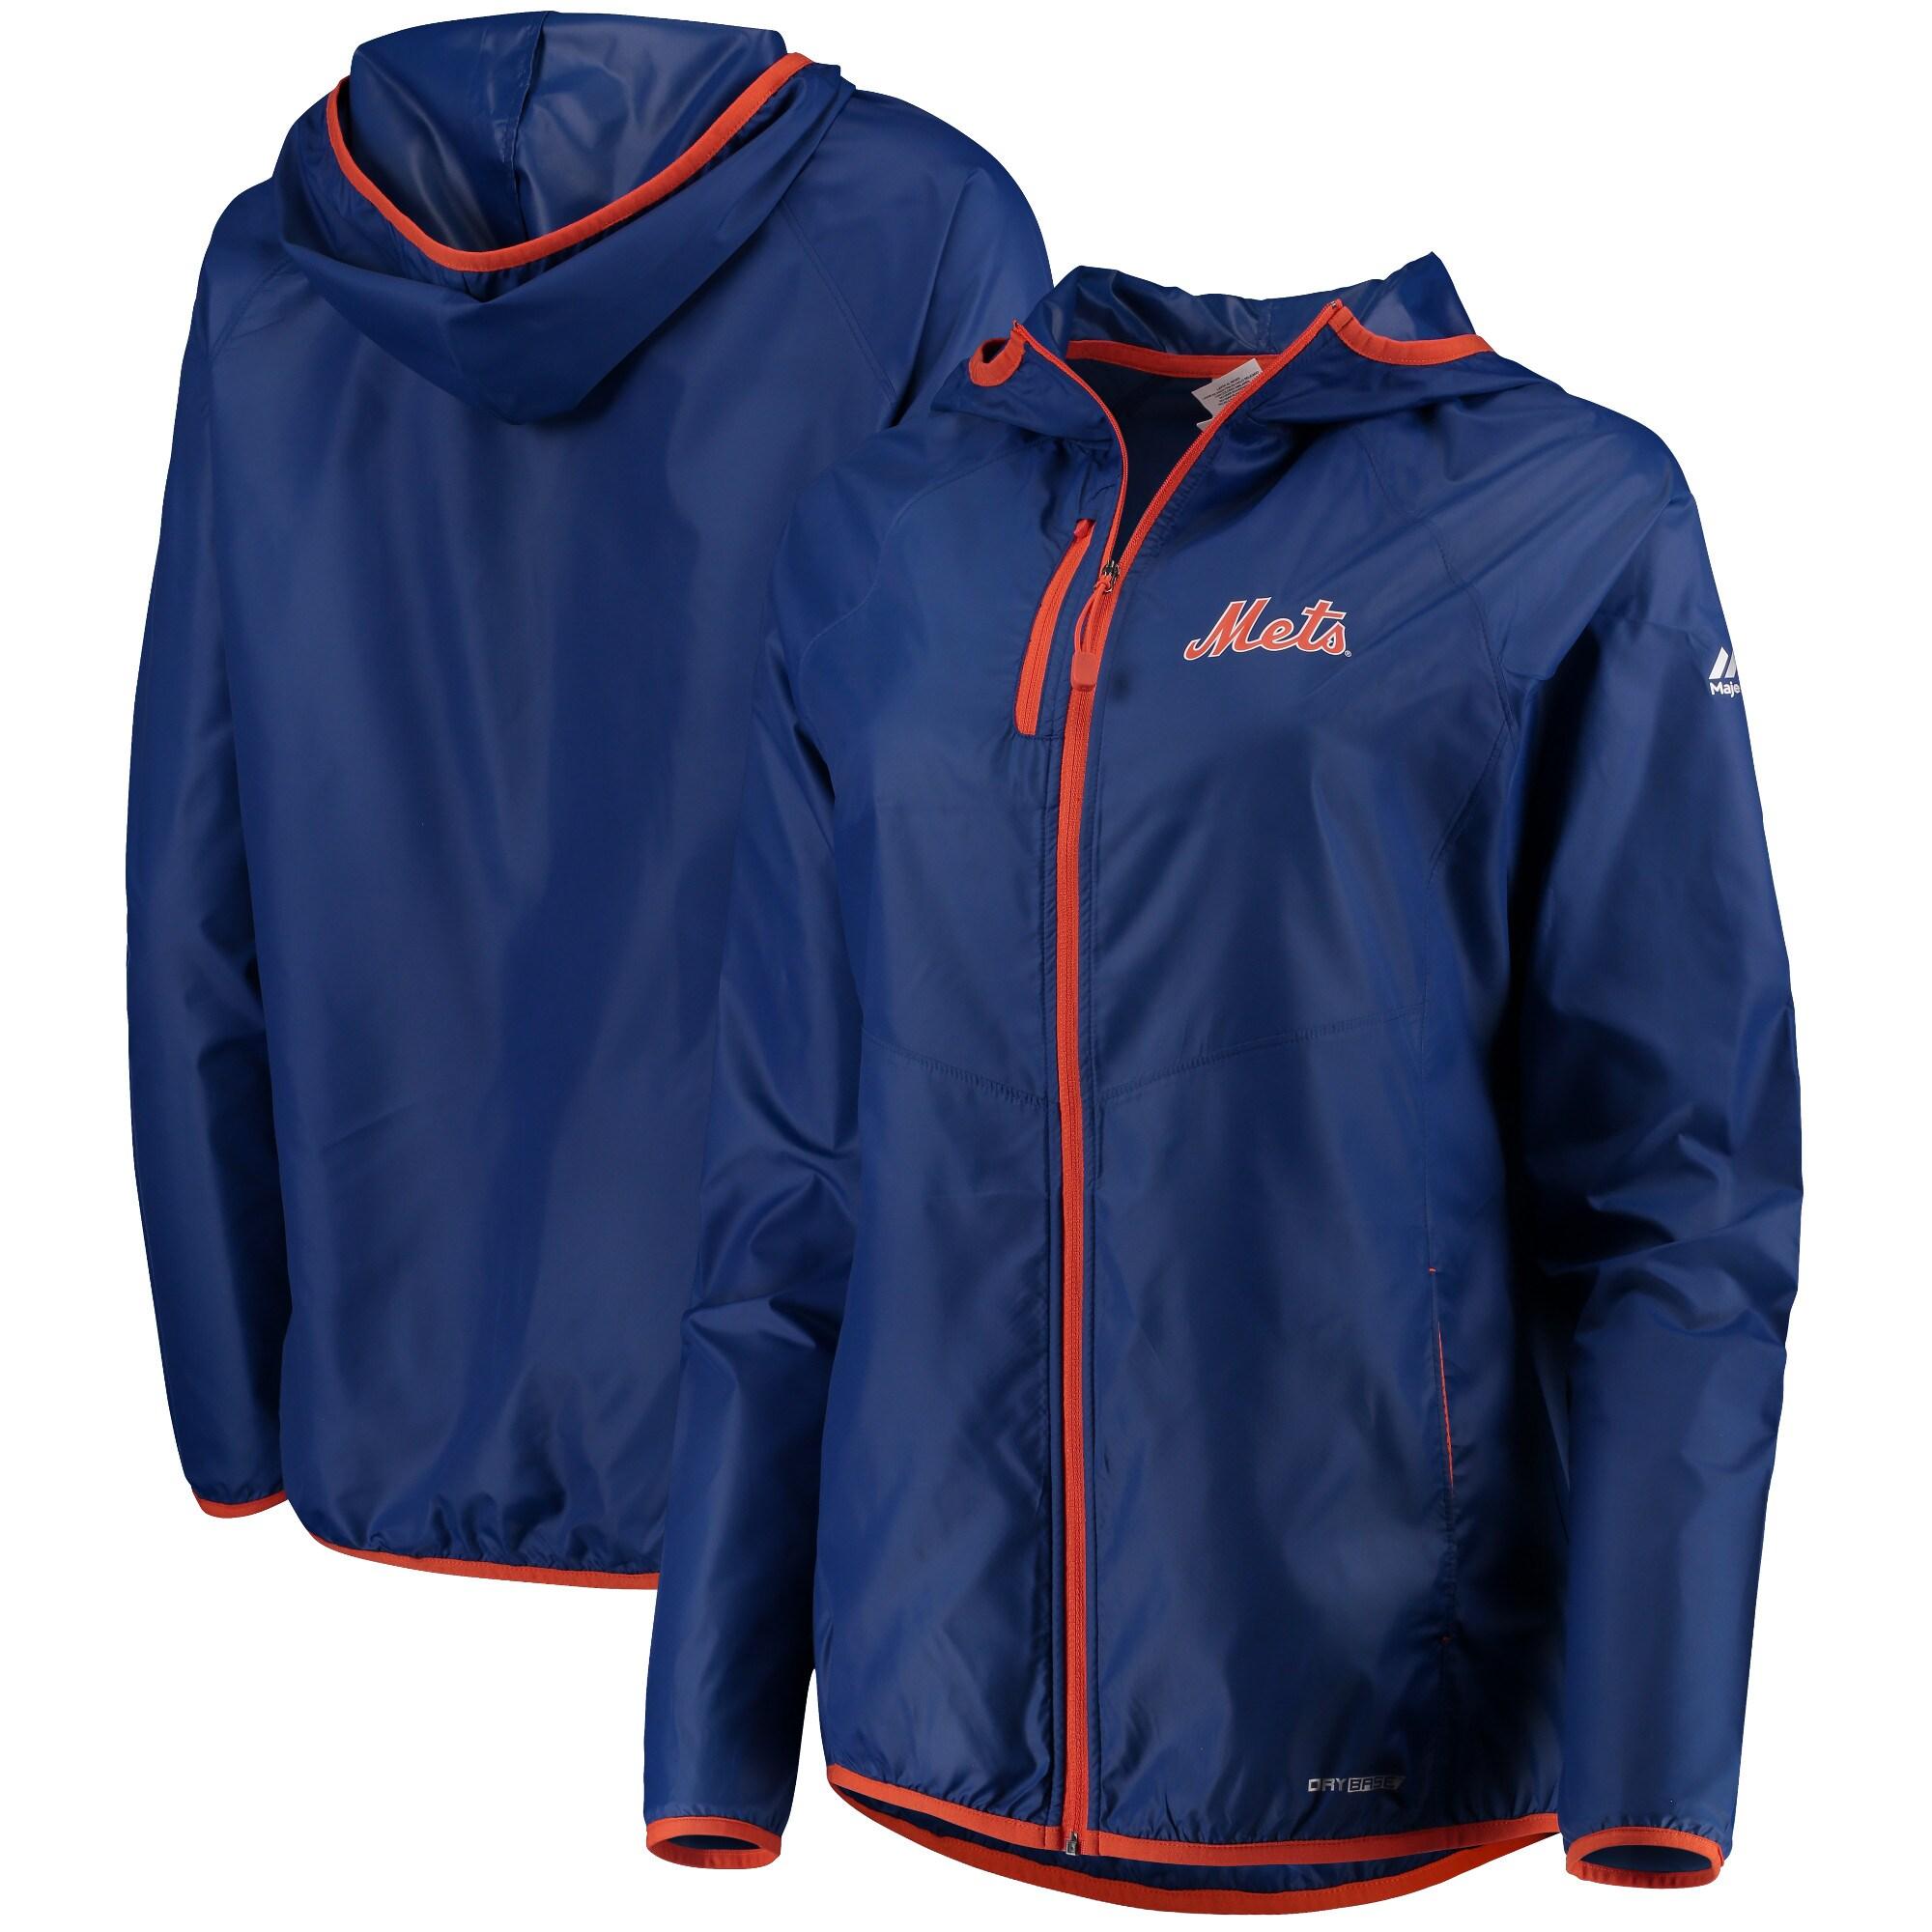 New York Mets Majestic Women's Absolute Dominance Full-Zip Jacket - Royal